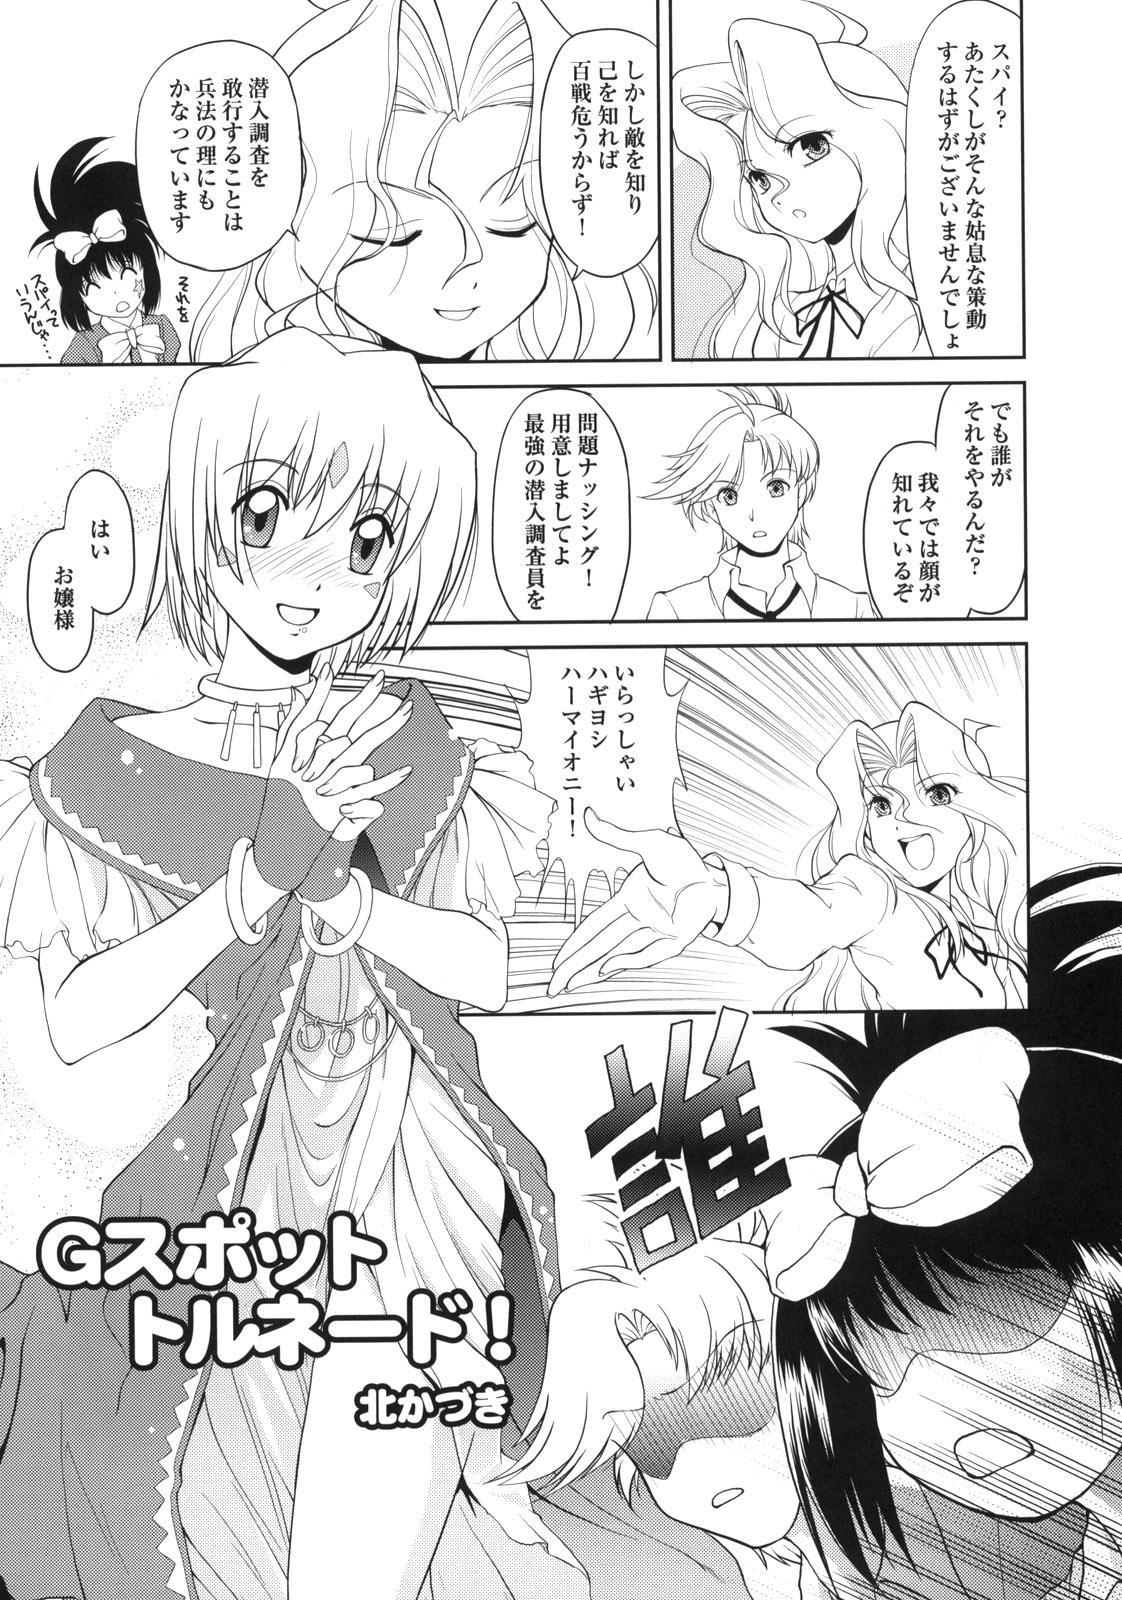 Hajime-chan ga Ichiban! 19